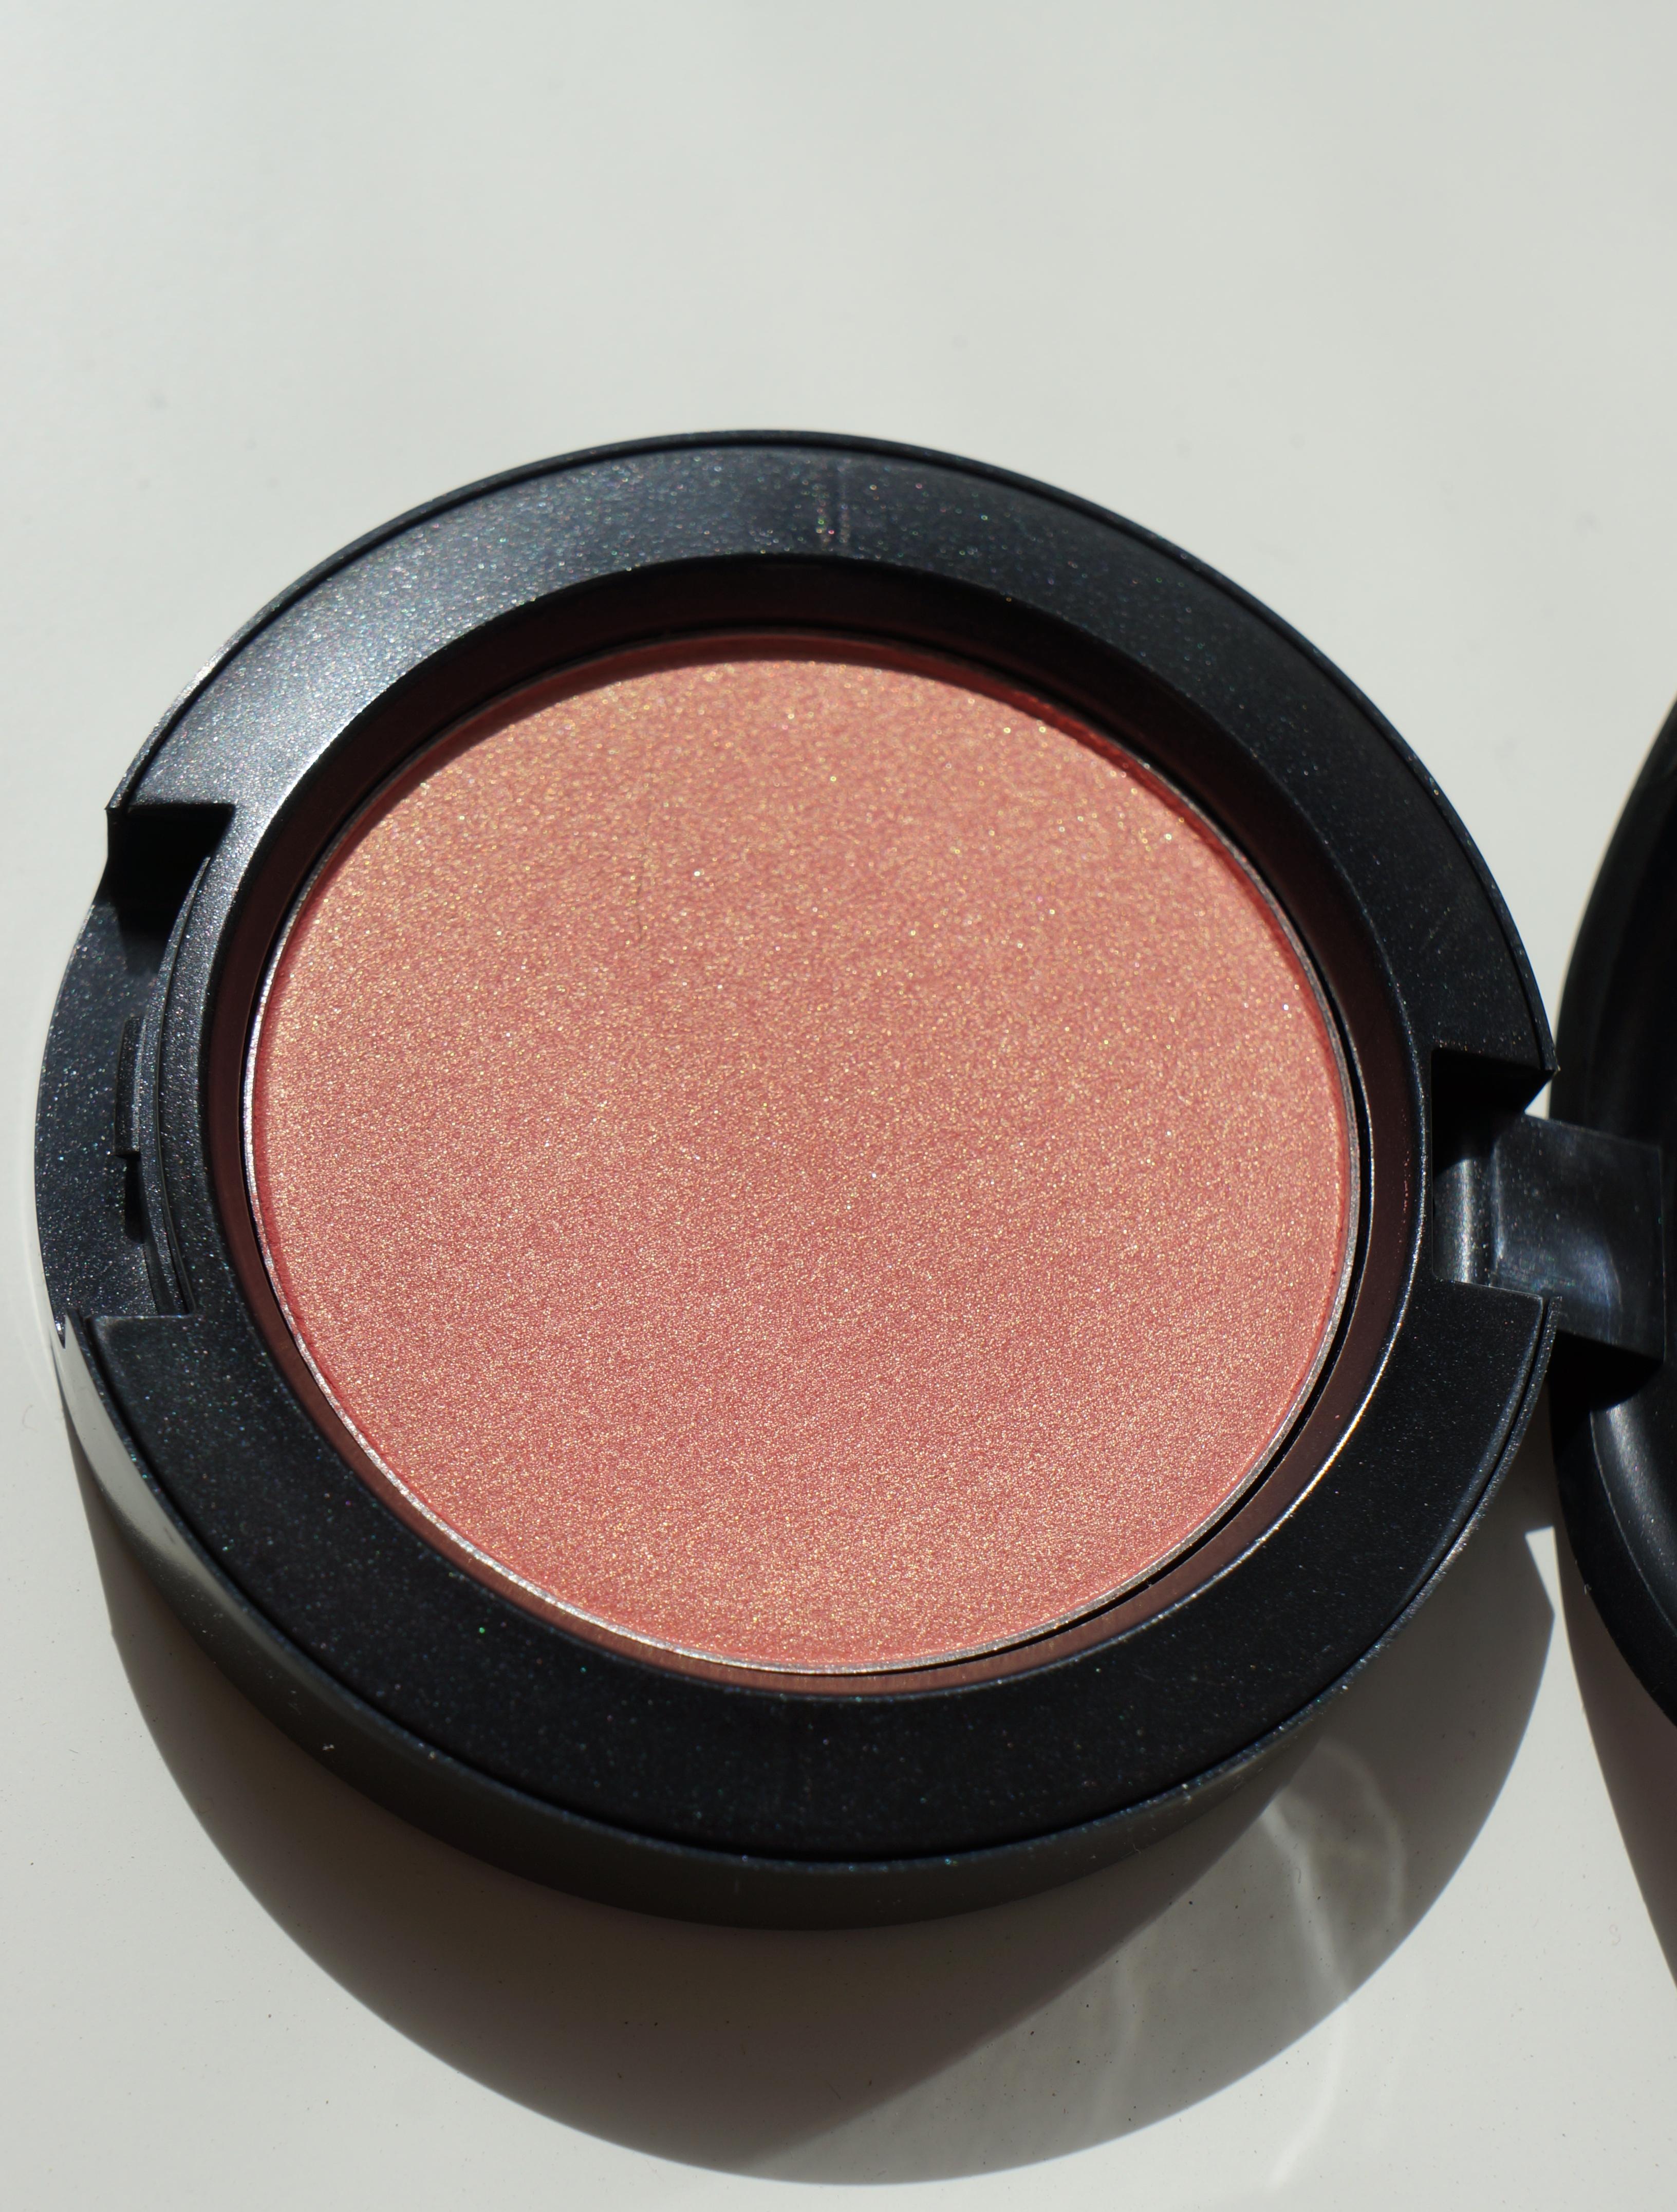 Springsheen blush by MAC/ Pic by kiwikoo